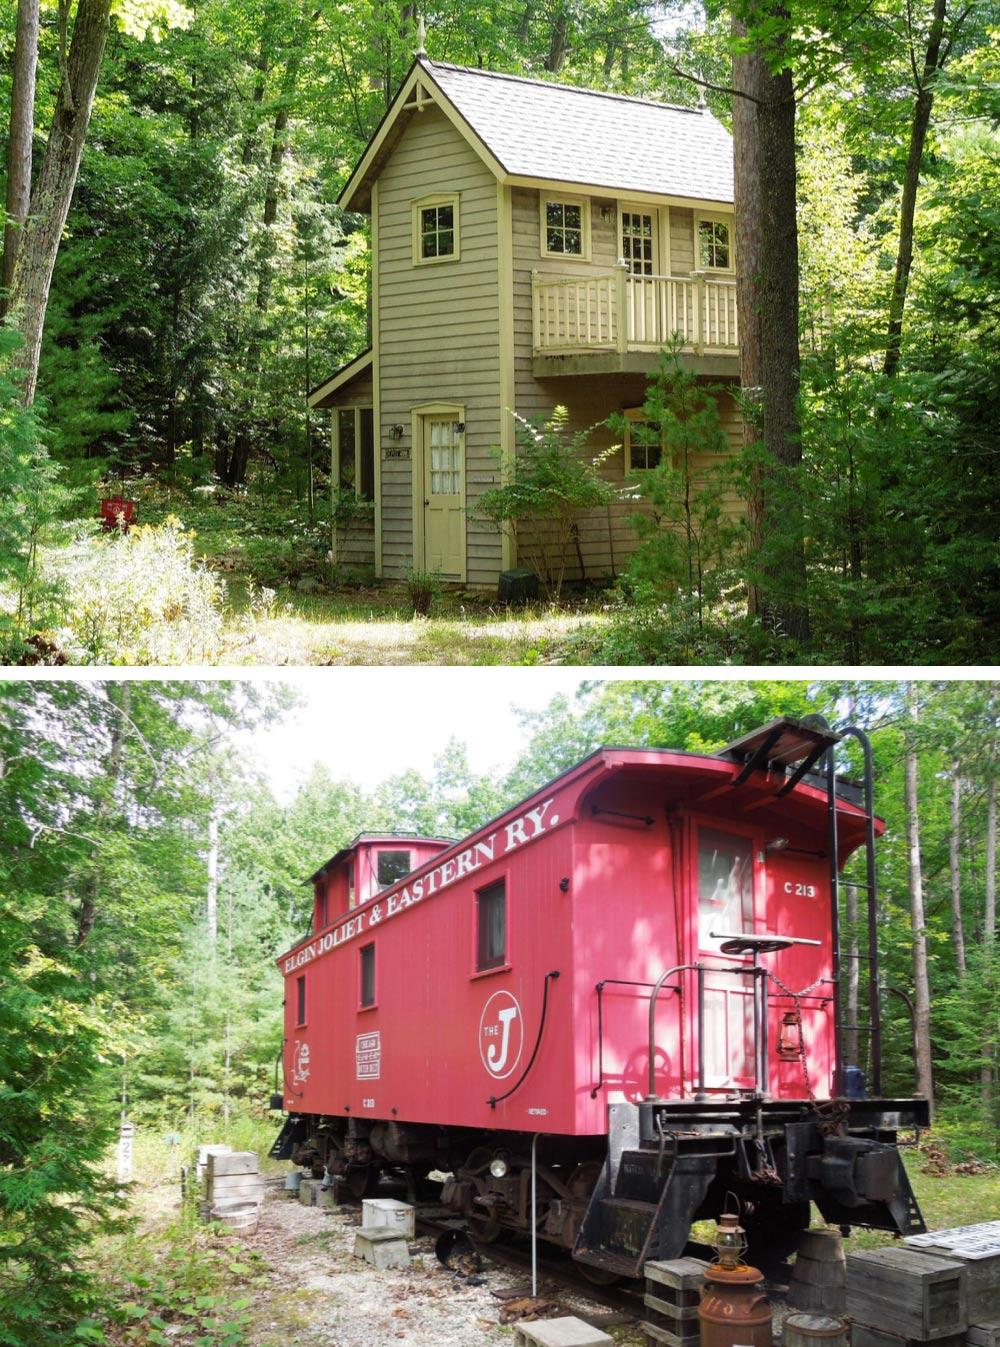 Cabaña con vagón de tren en EEUU